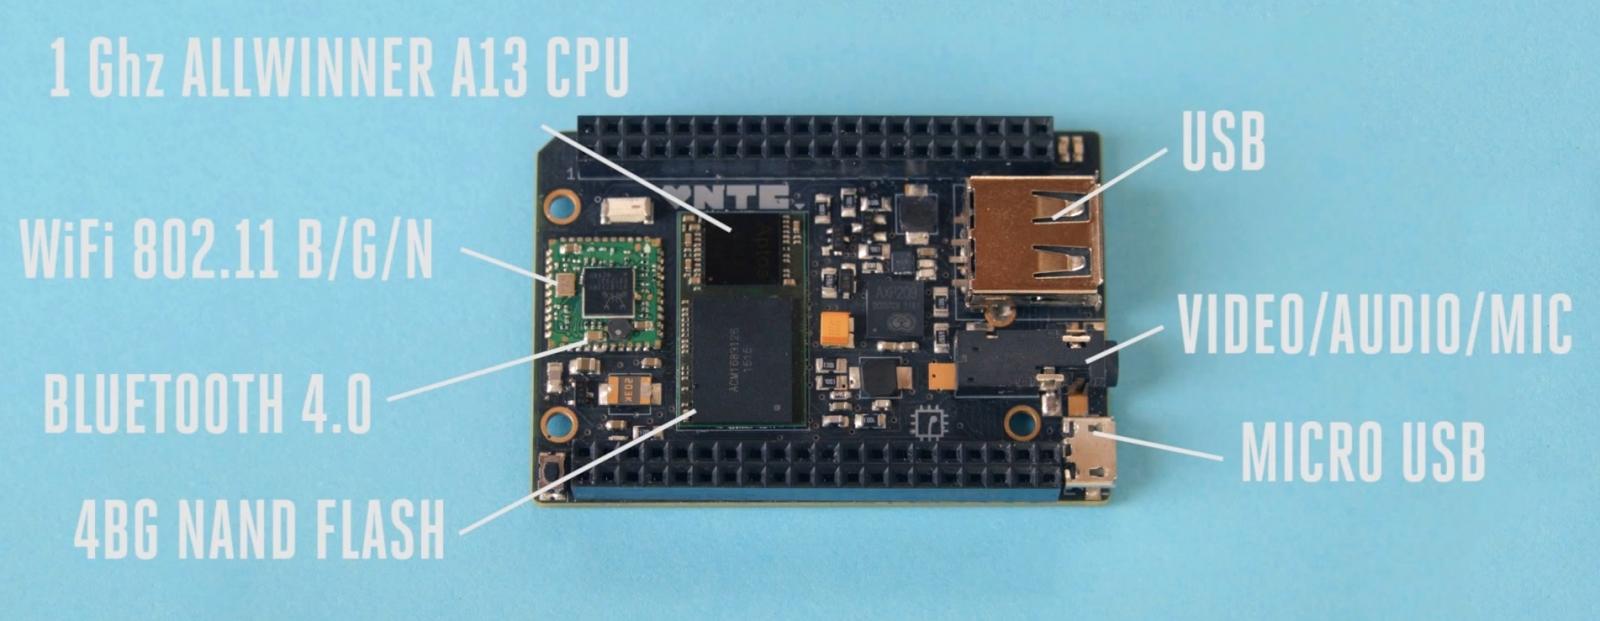 CHIP linux PC $9 computer